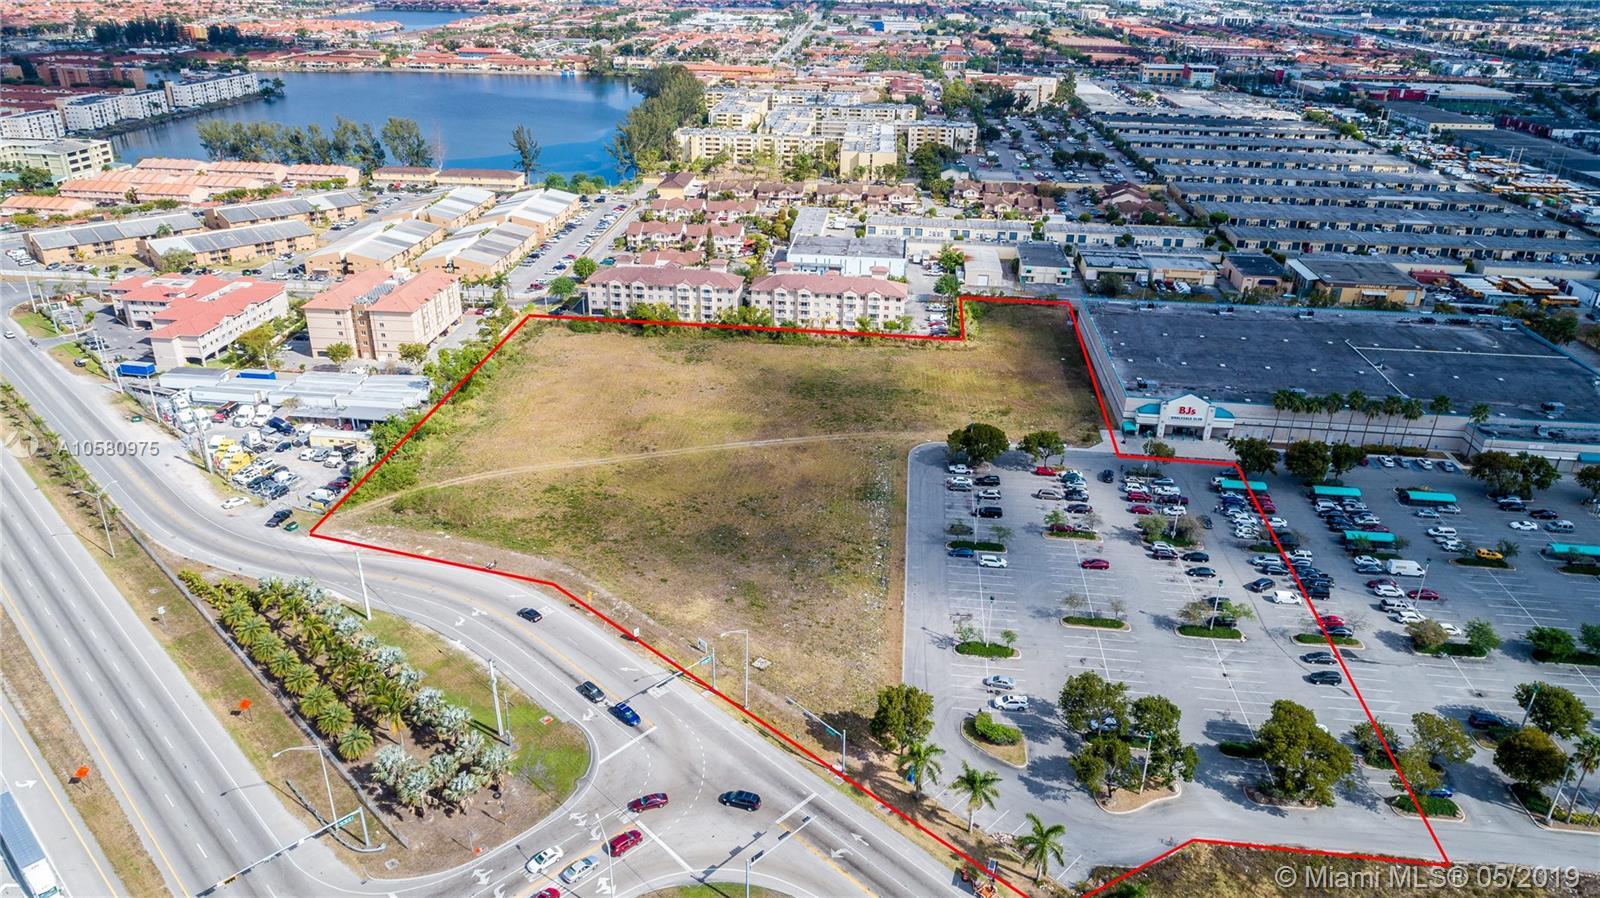 Palmetto & Okeechobee, Hialeah Gardens, FL 33016